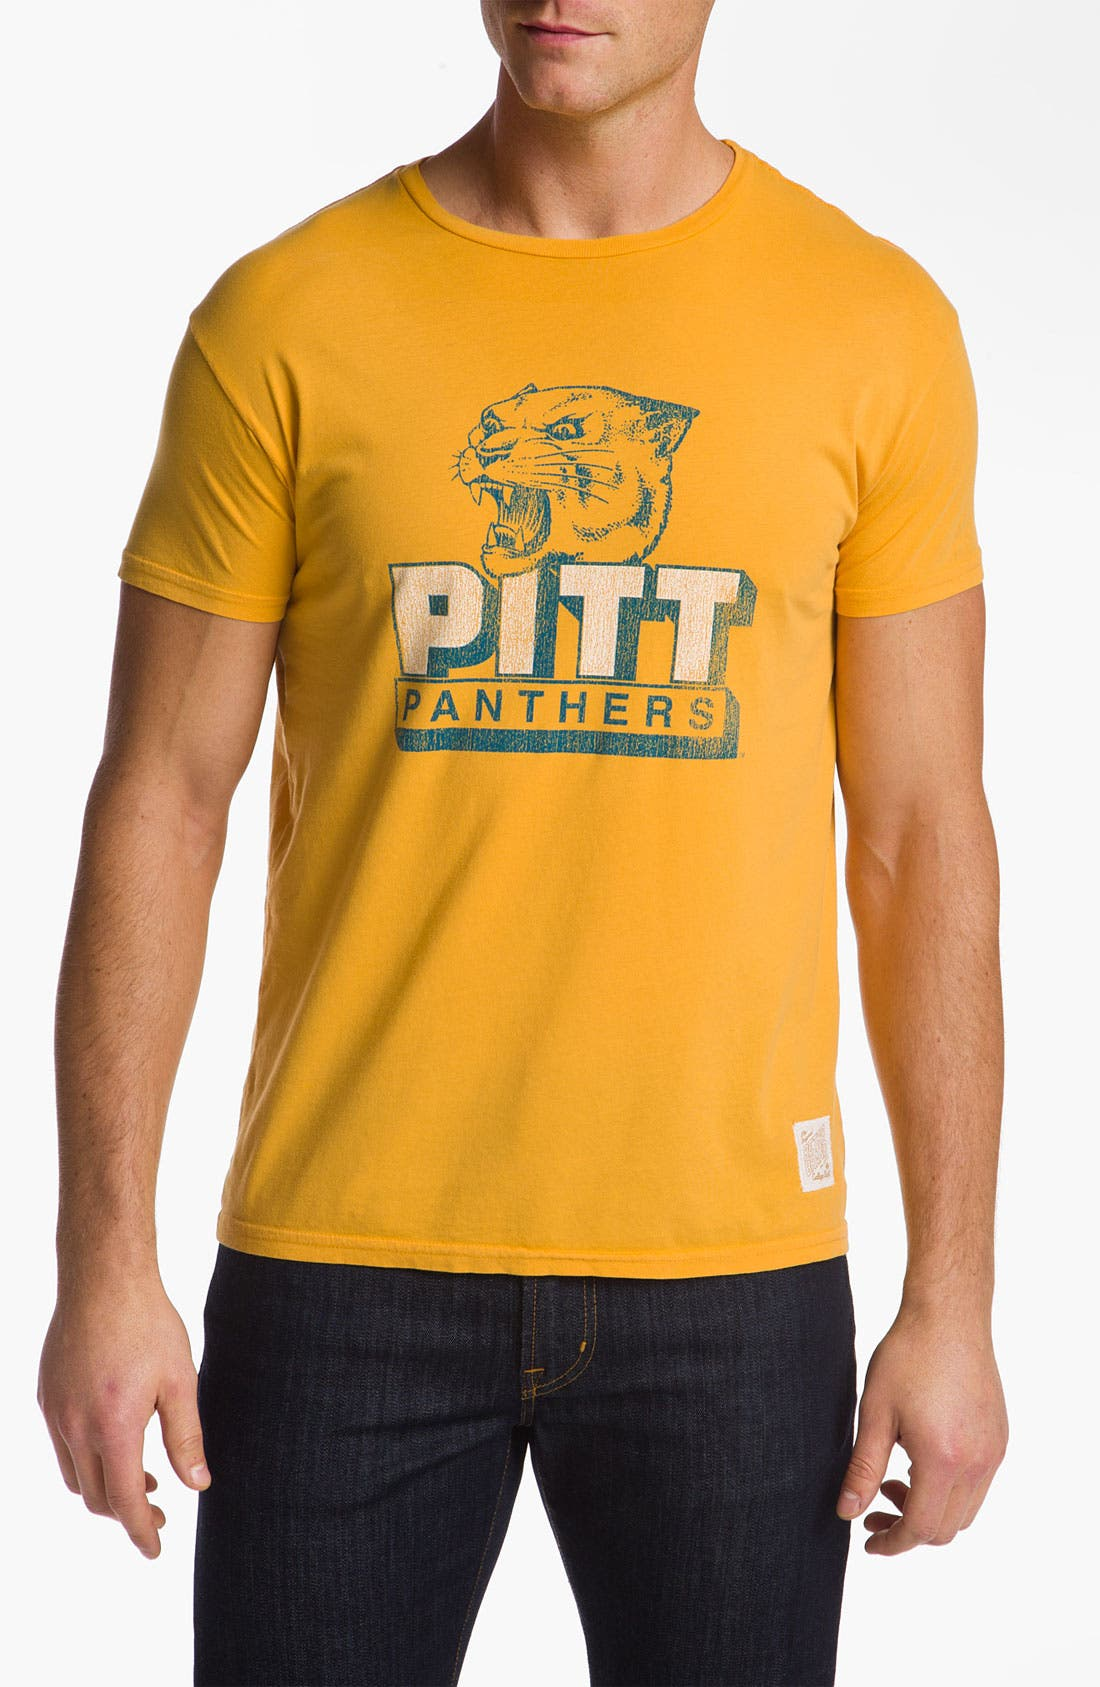 Main Image - The Original Retro Brand 'Pittsburgh Panthers' T-Shirt